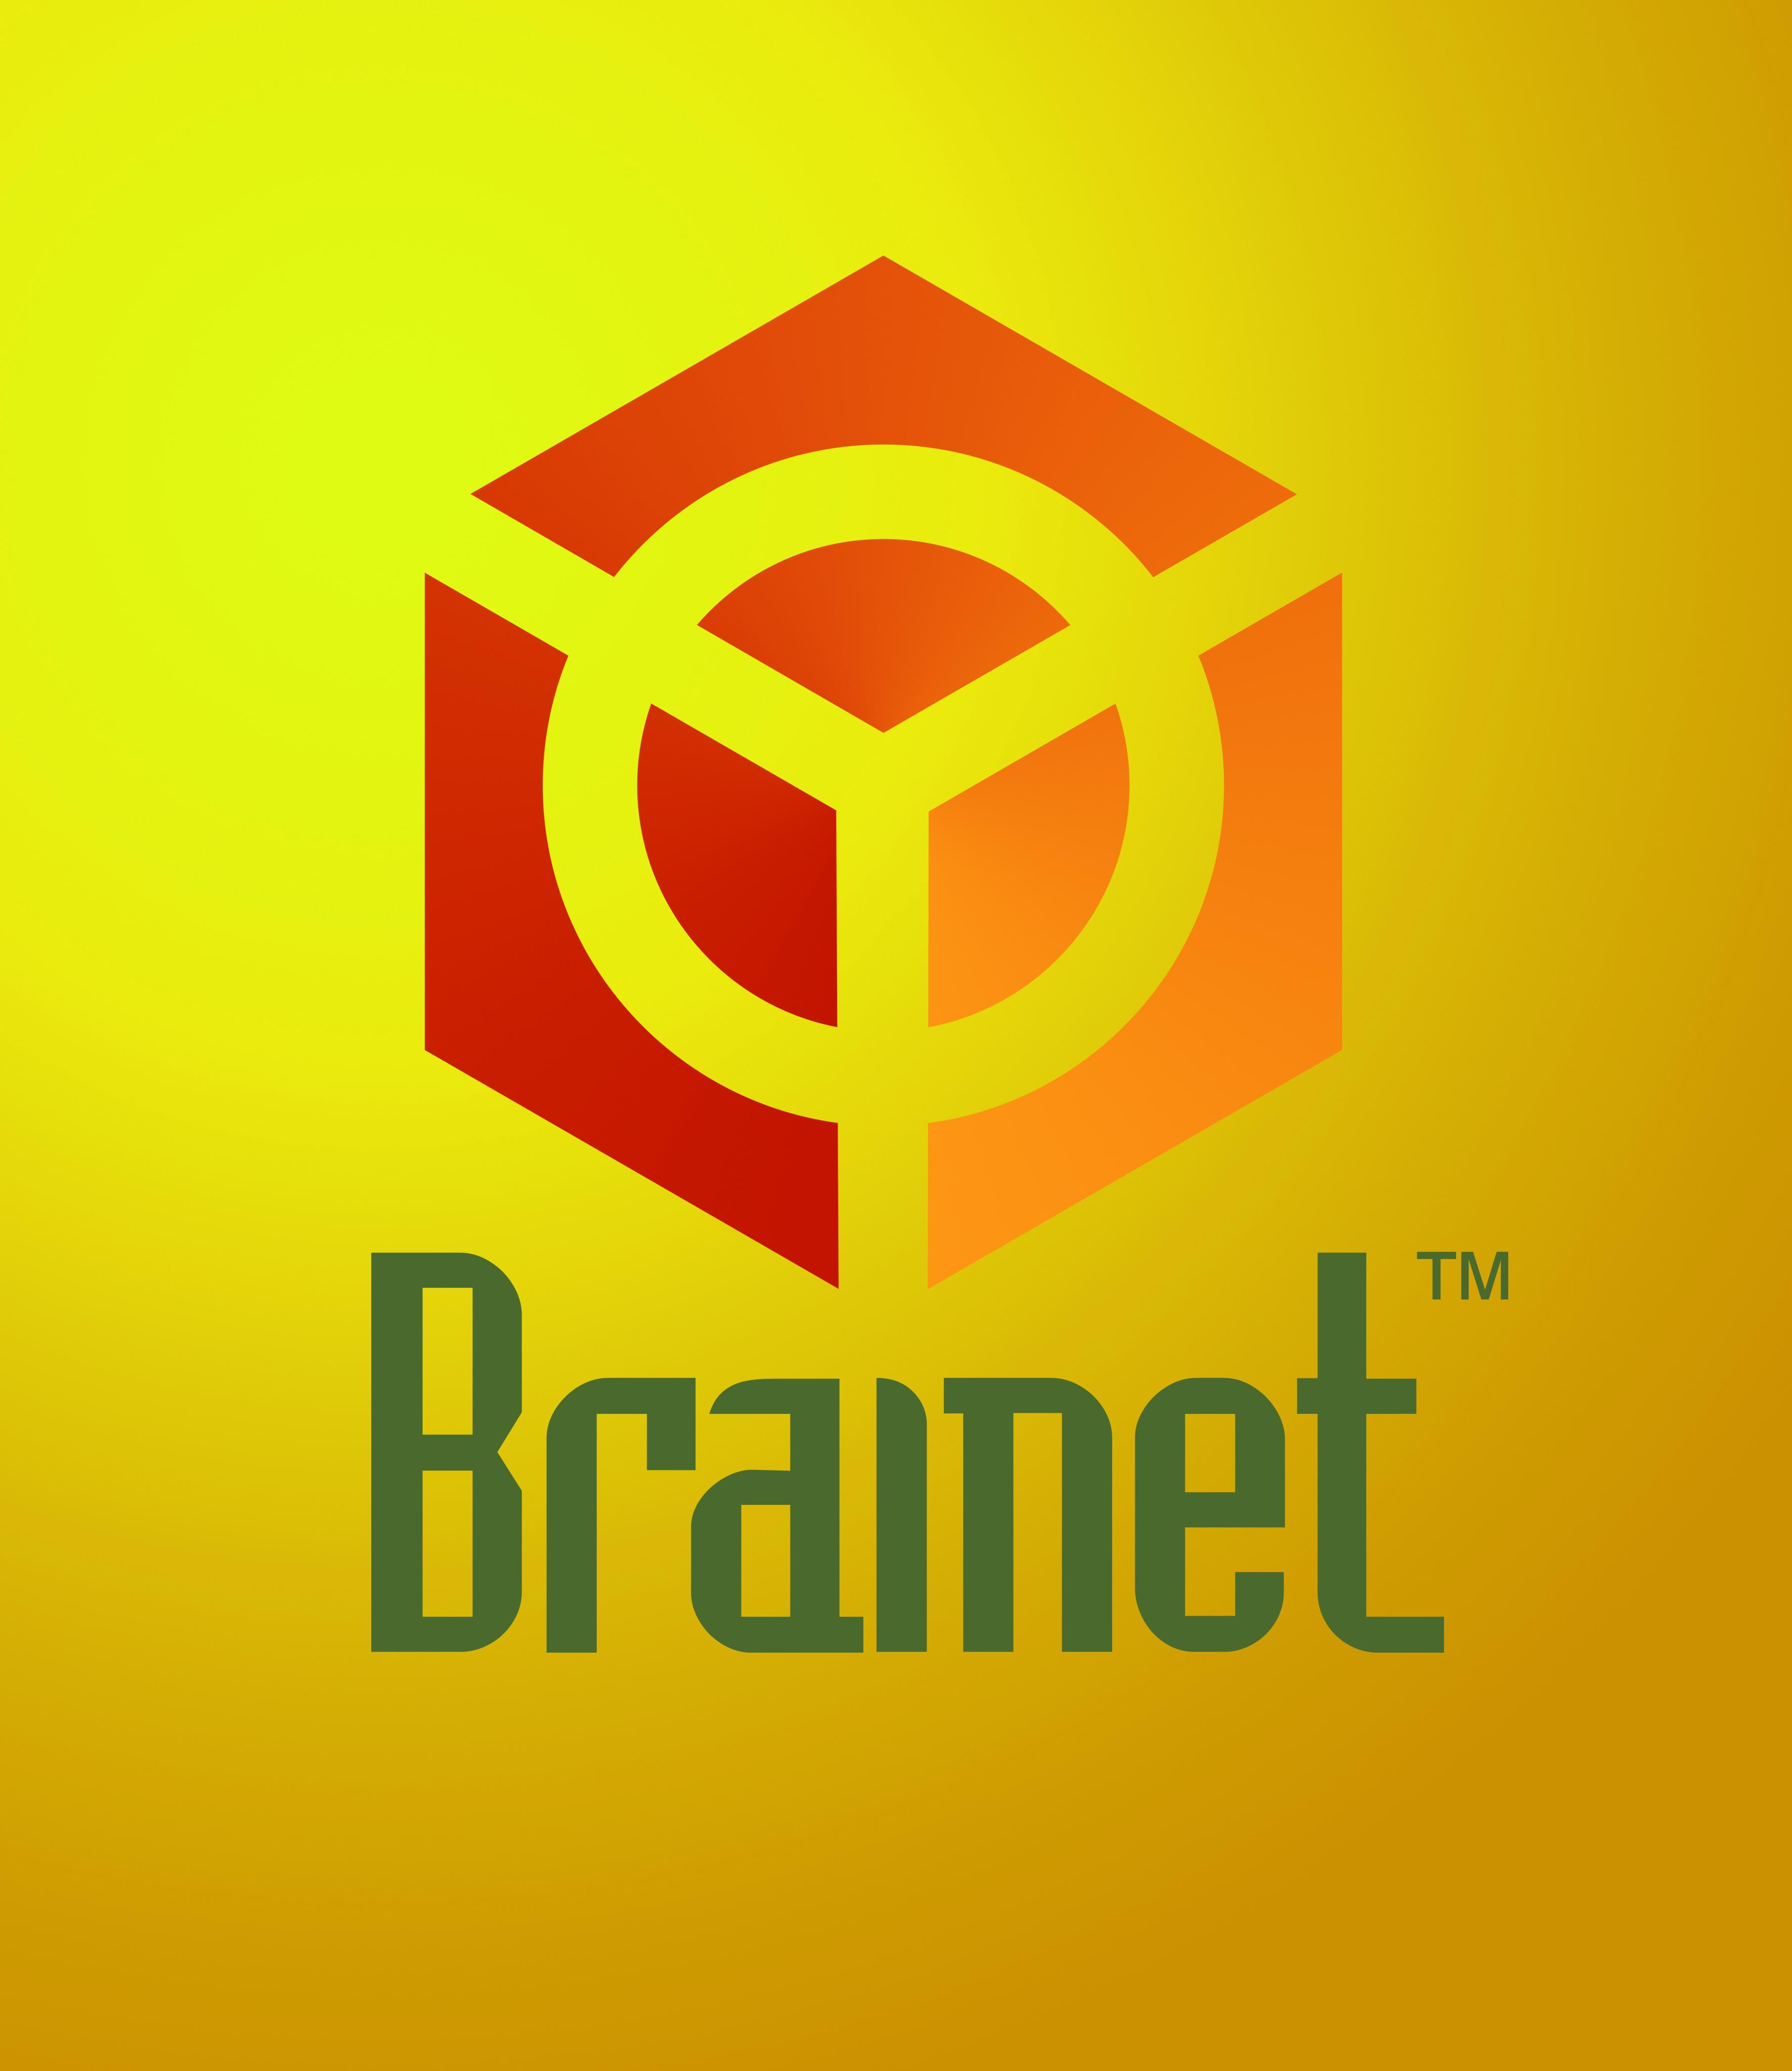 Brainet